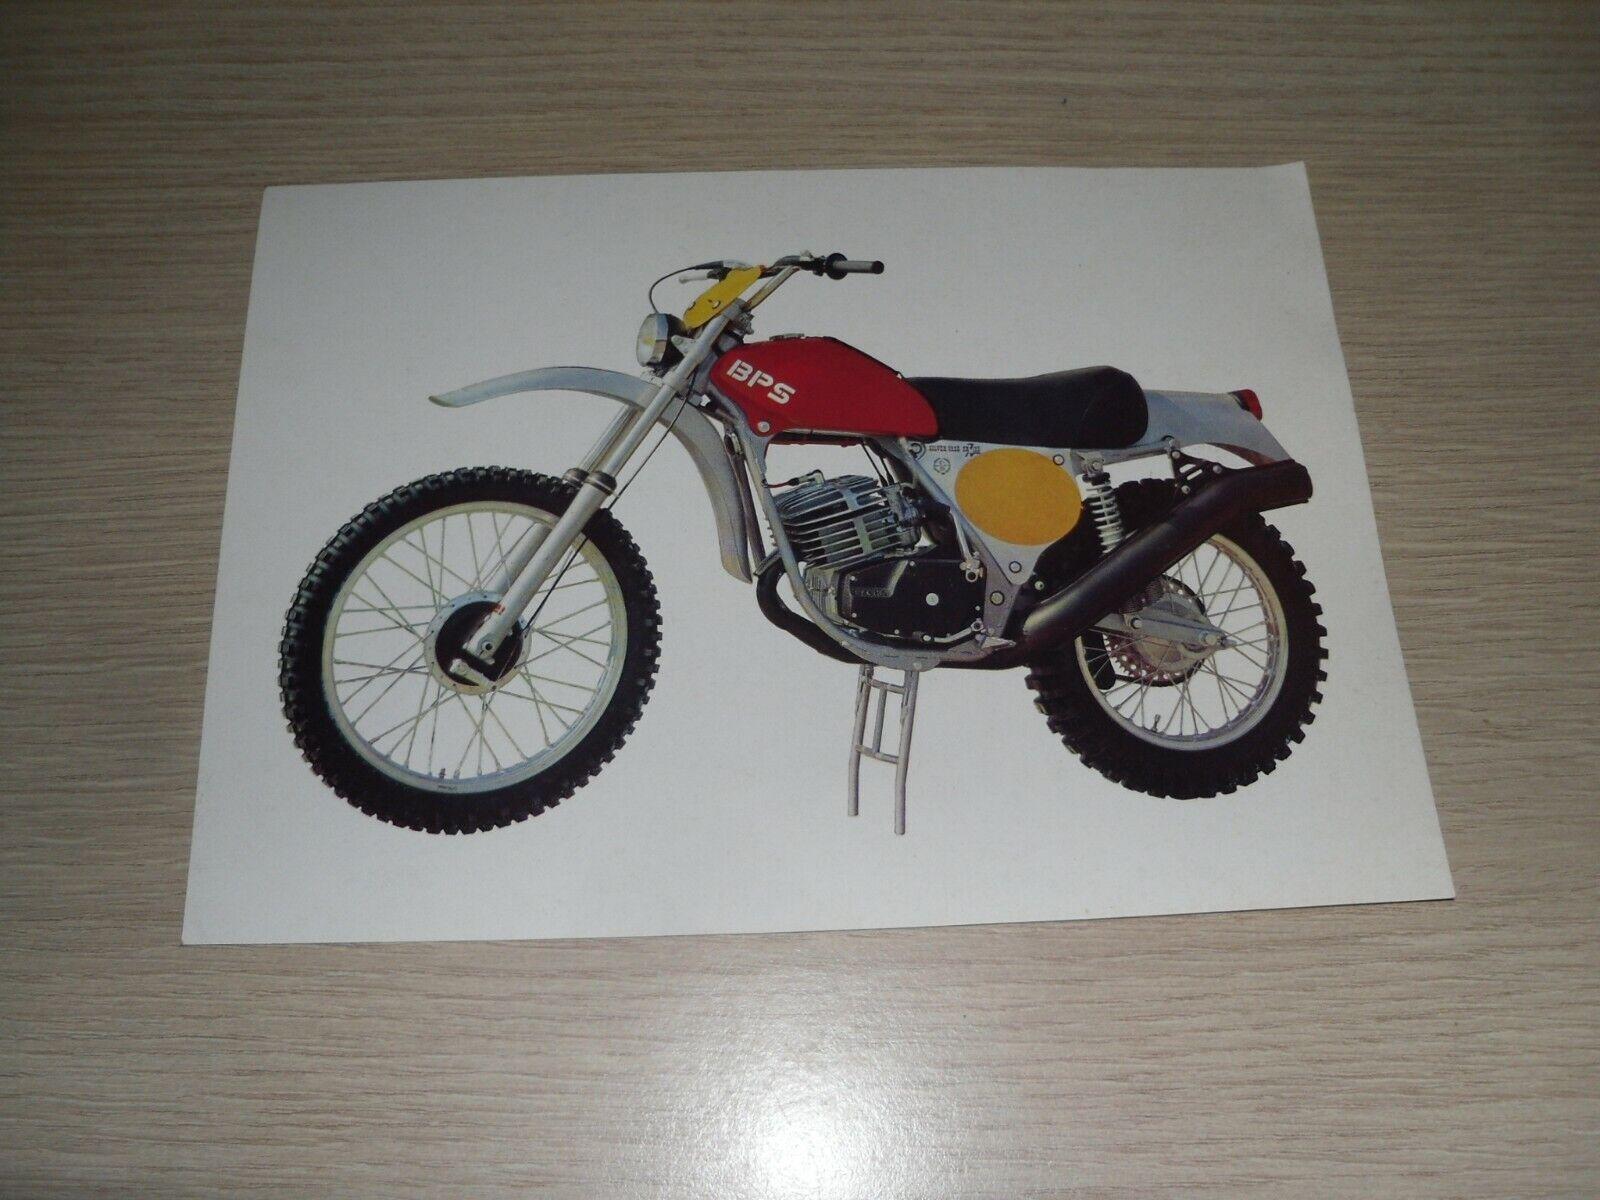 Photo, documentation moto  vintage bps enduro silver vase 125cc